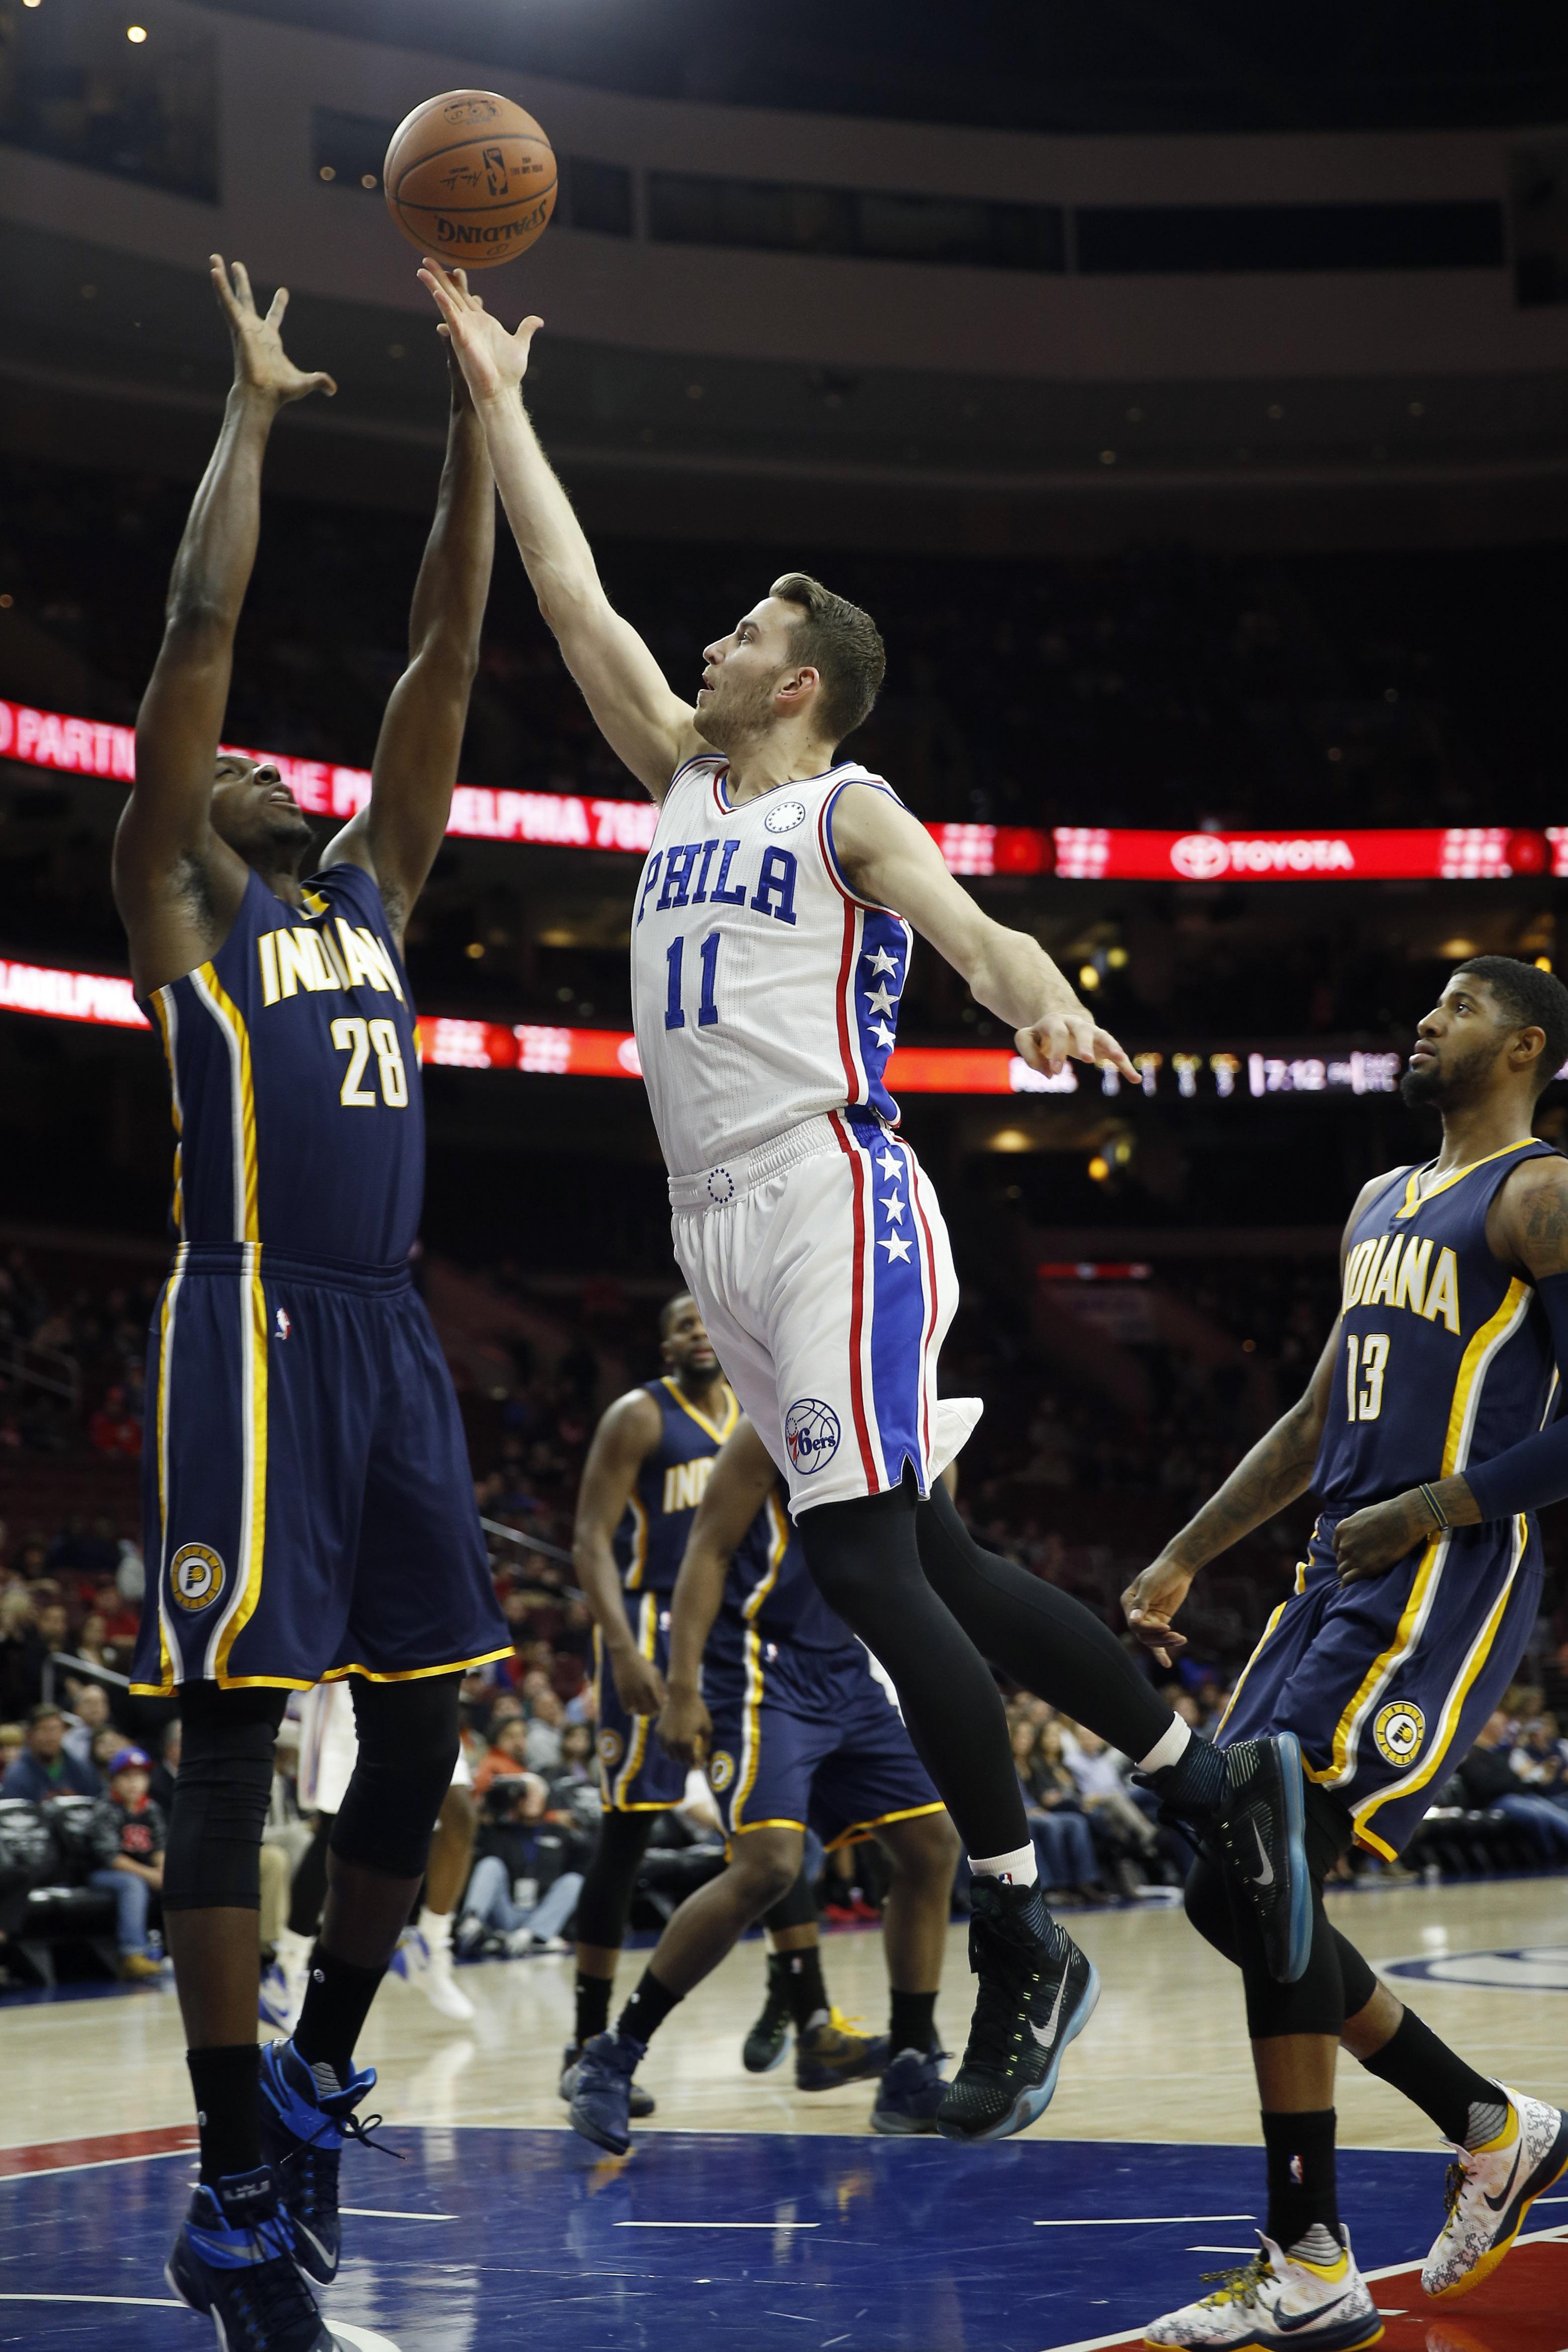 Philadelphia 76ers' Nik Stauskas (11) goes up for a shot between Indiana Pacers' Ian Mahinmi (28) and Paul George (13) during the first half of an NBA basketball game, Wednesday, Nov. 18, 2015, in Philadelphia. (AP Photo/Matt Slocum)